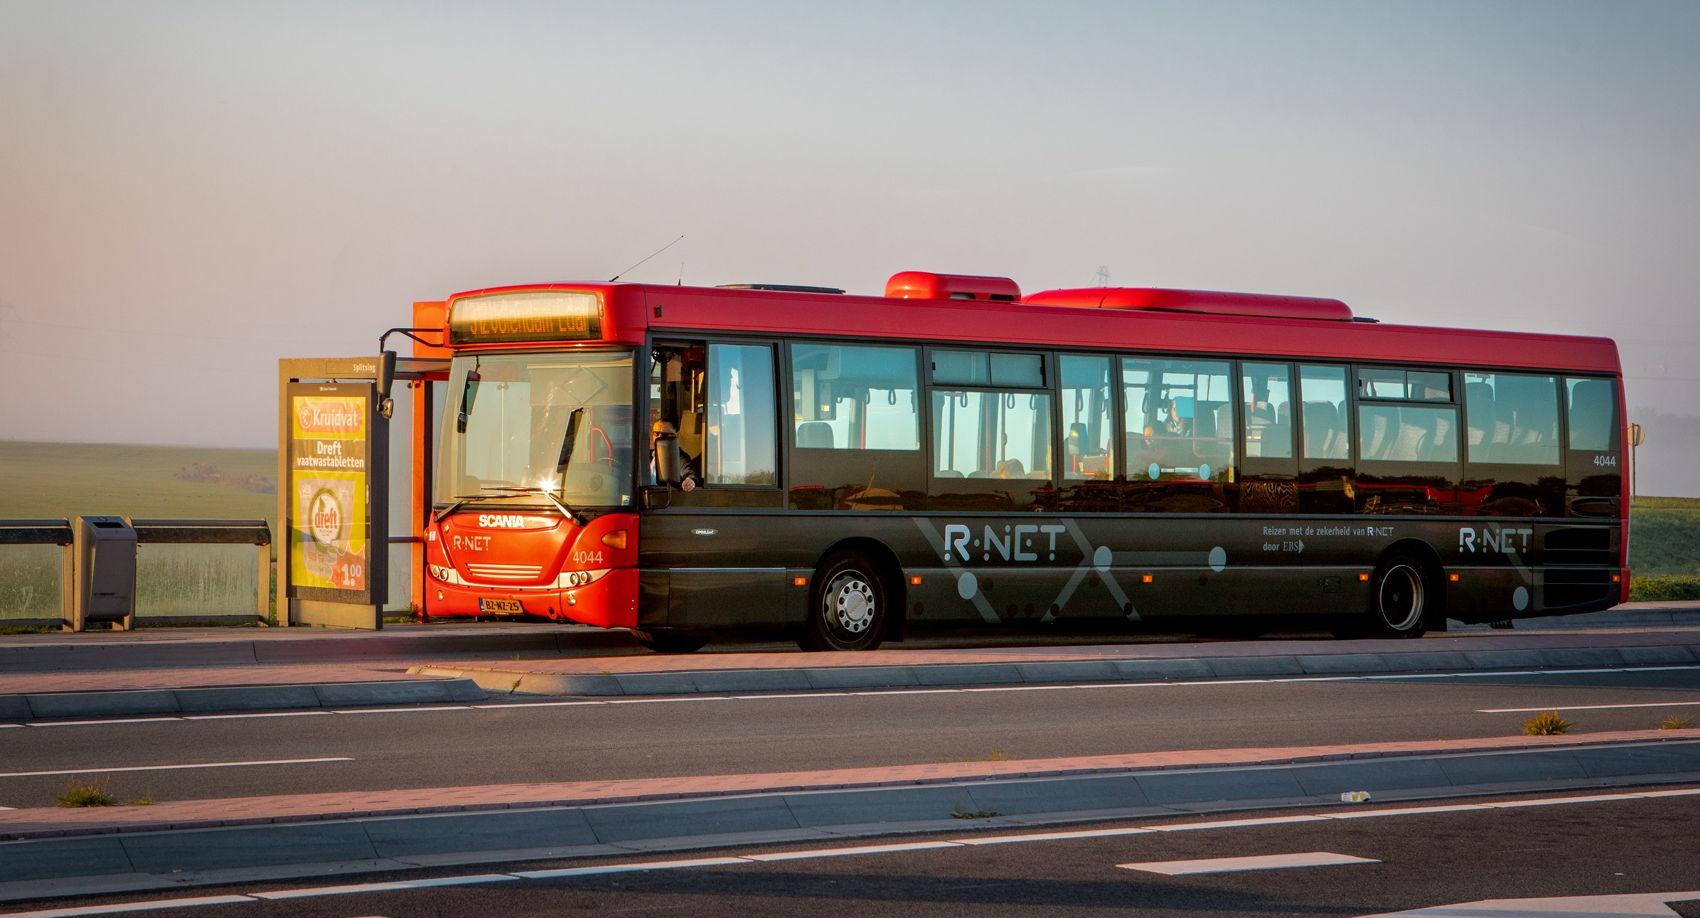 Bus Waterland featured